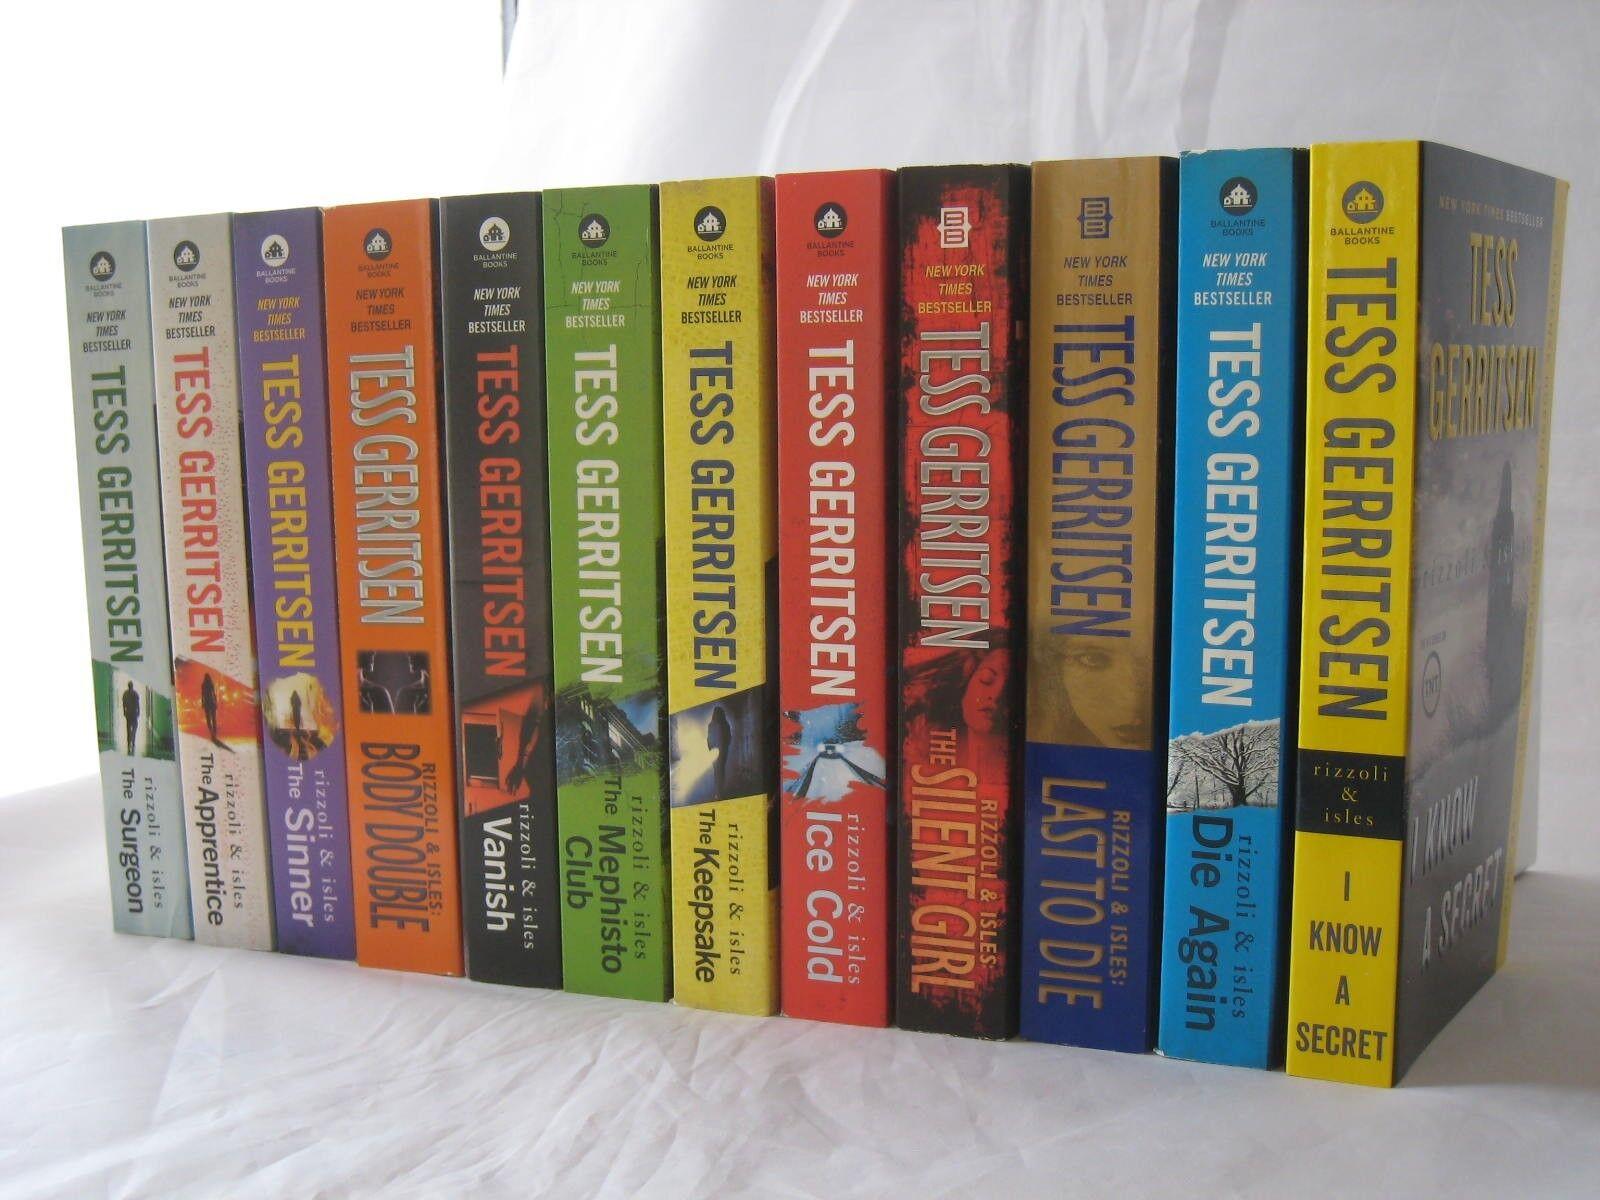 Rizzoli & Isles Novels by Tess Gerritsen